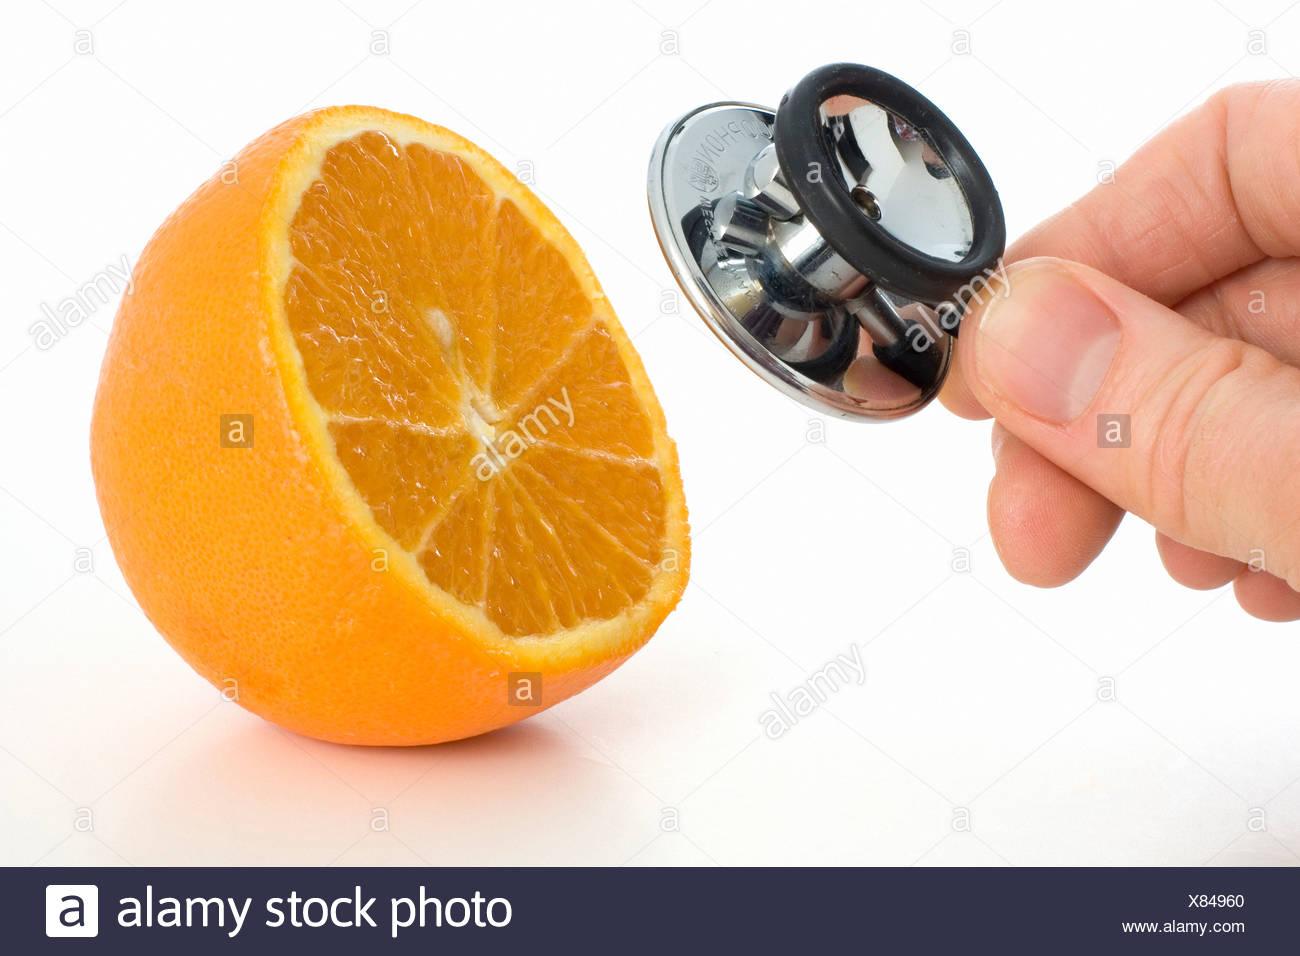 Orange, vitamin, vitamin C, vitamins, rich in vitamins, healthy, health, food, juice, fruit, cold, prevent, stethoscope, prevent - Stock Image